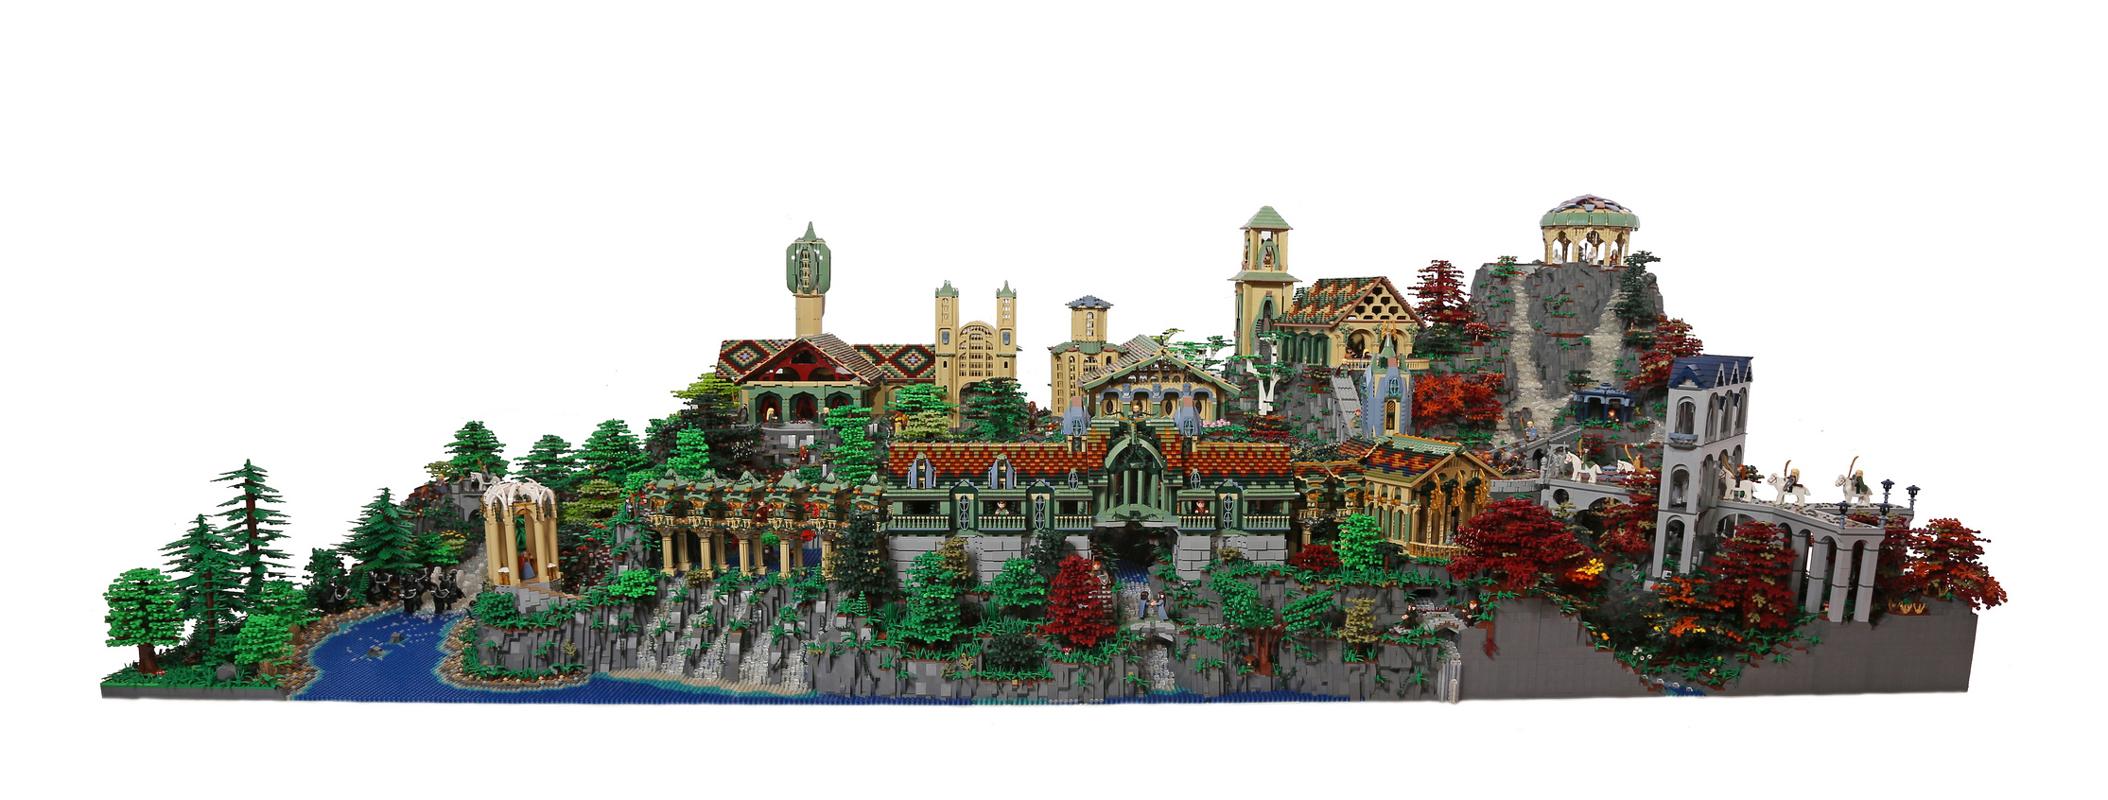 LEGO-Rivendell-Screen-Shot